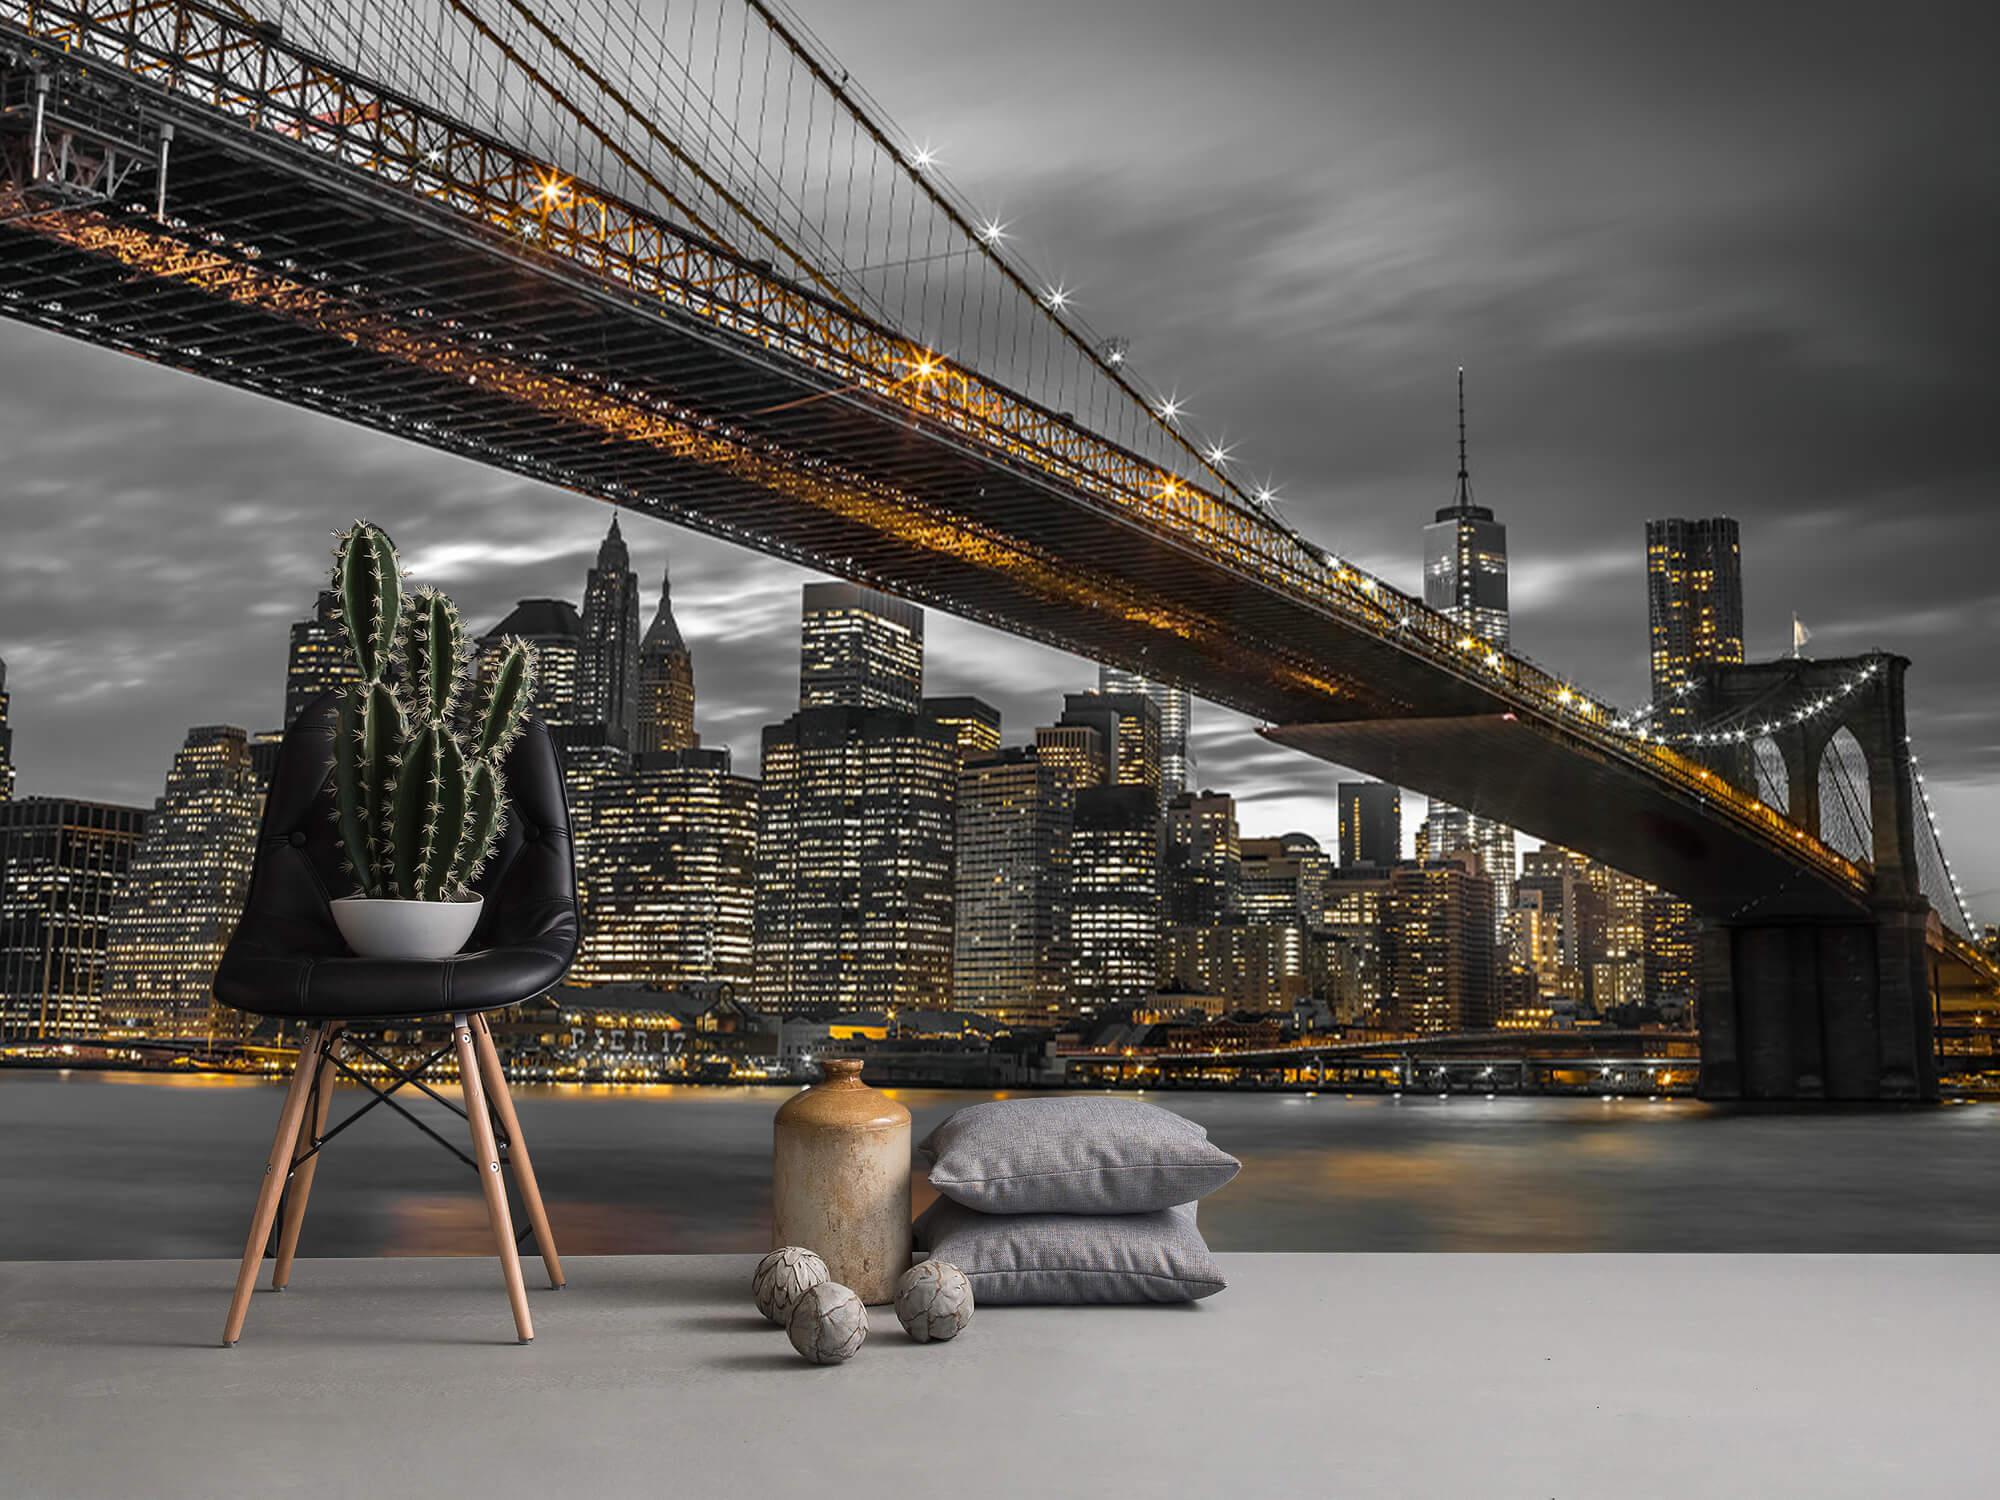 Brooklyn Bridge, New York 9